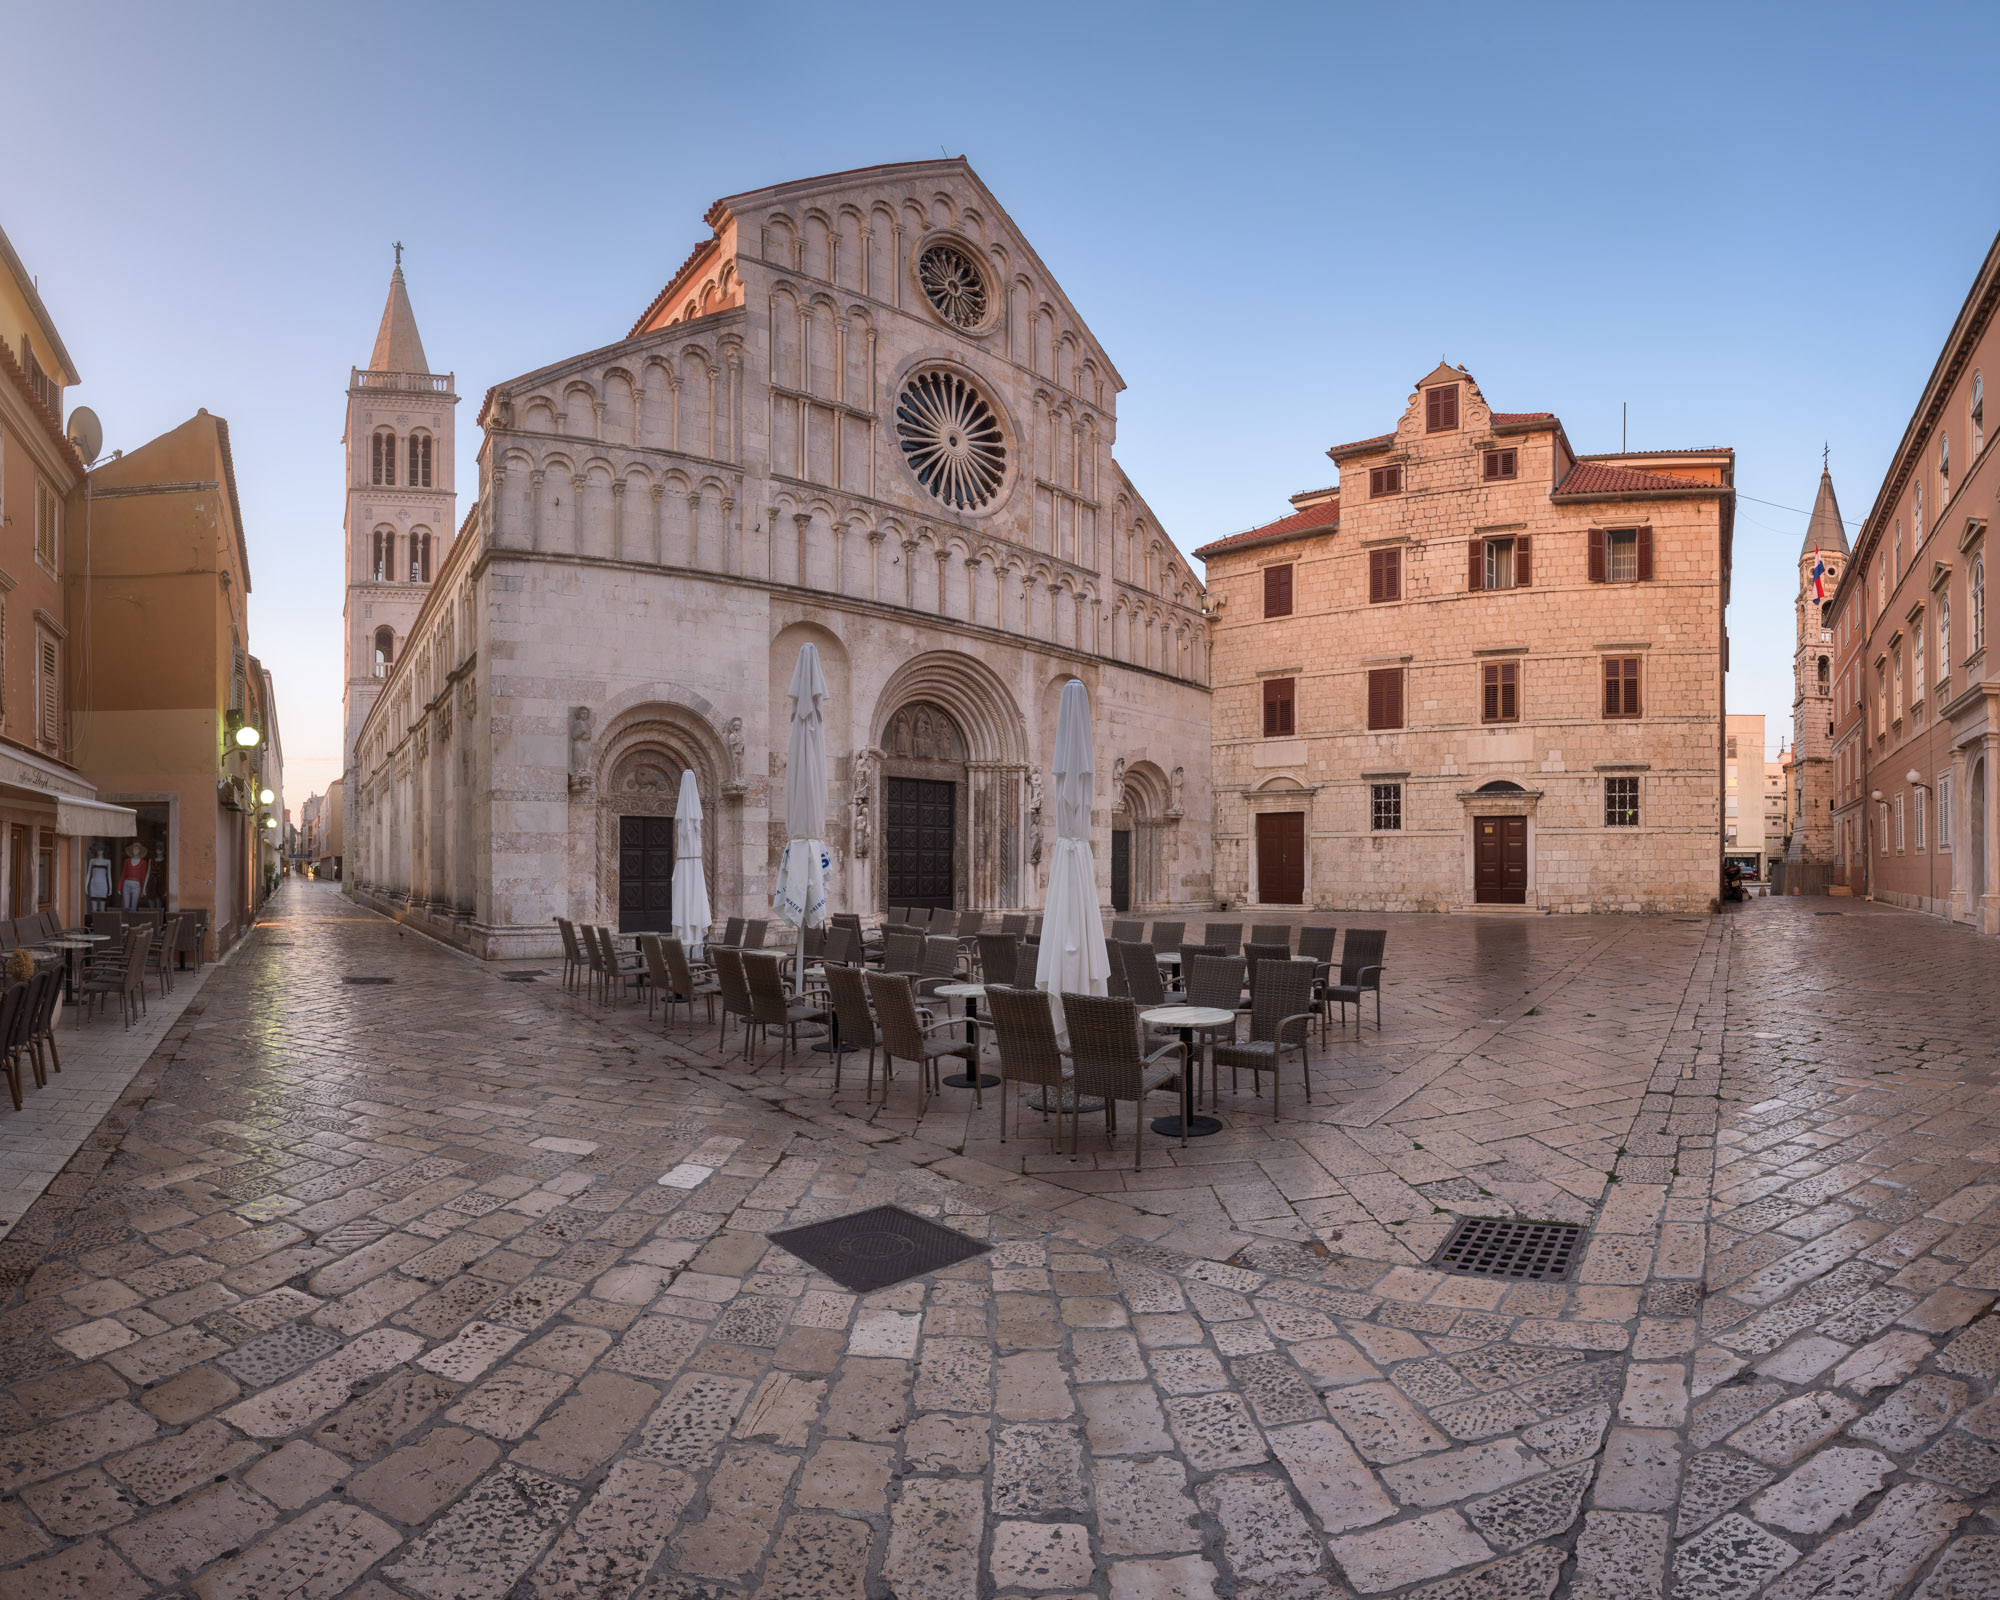 Cathedral of Saint Anastasia, Zadar, Croatia